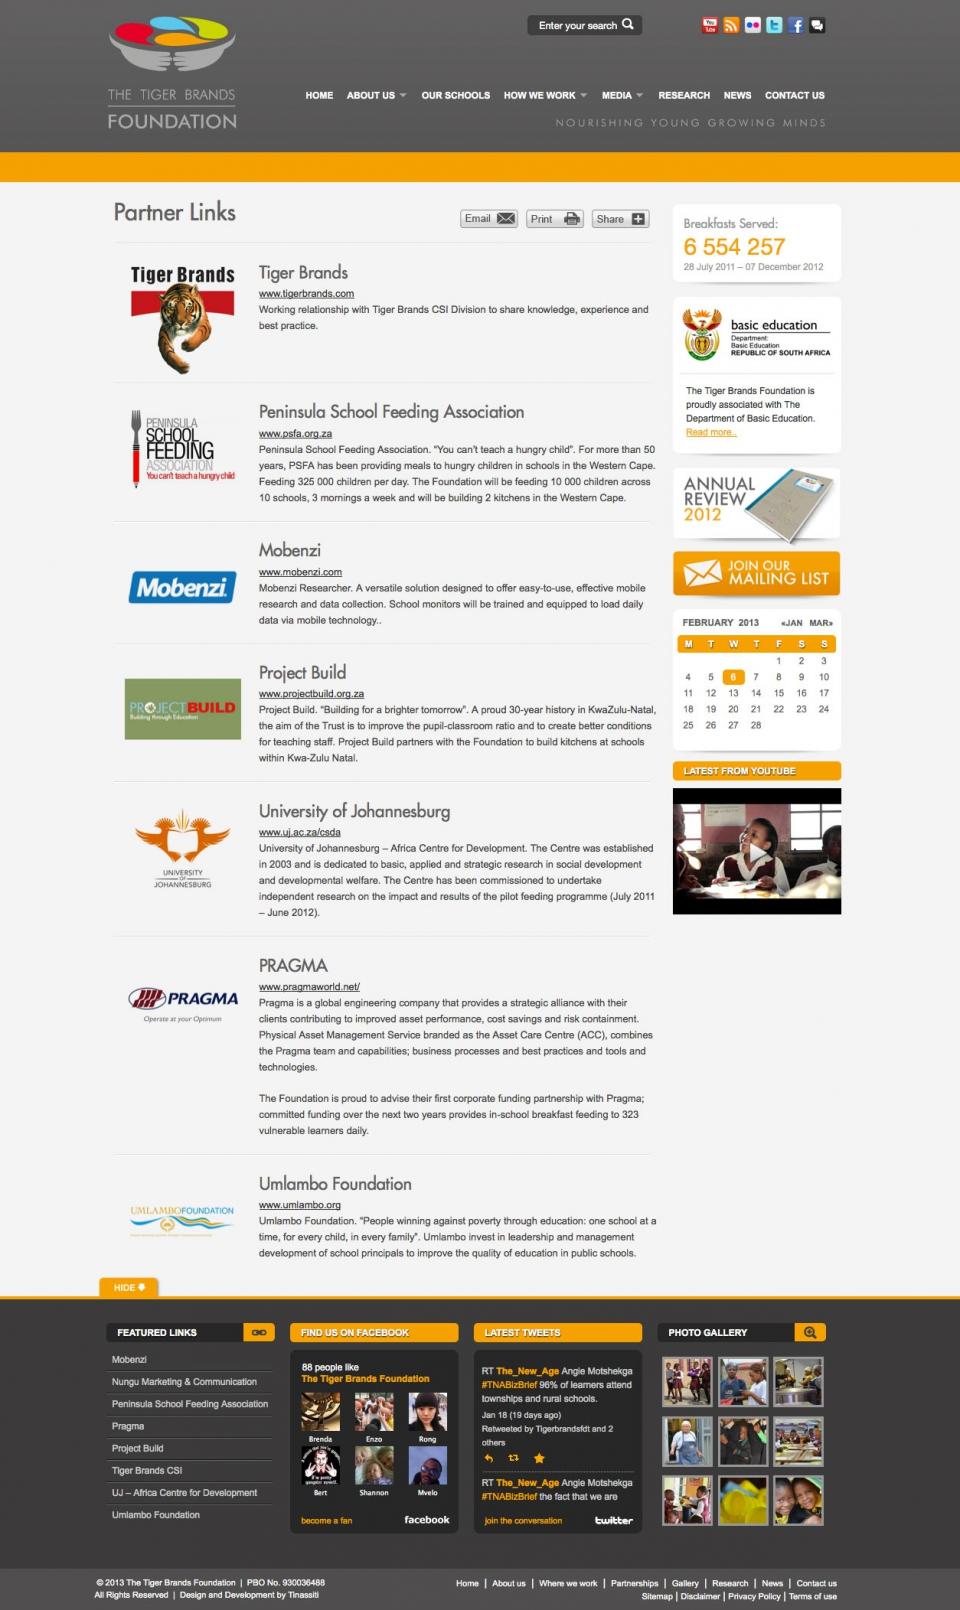 the-tiber-brands-foundation-7